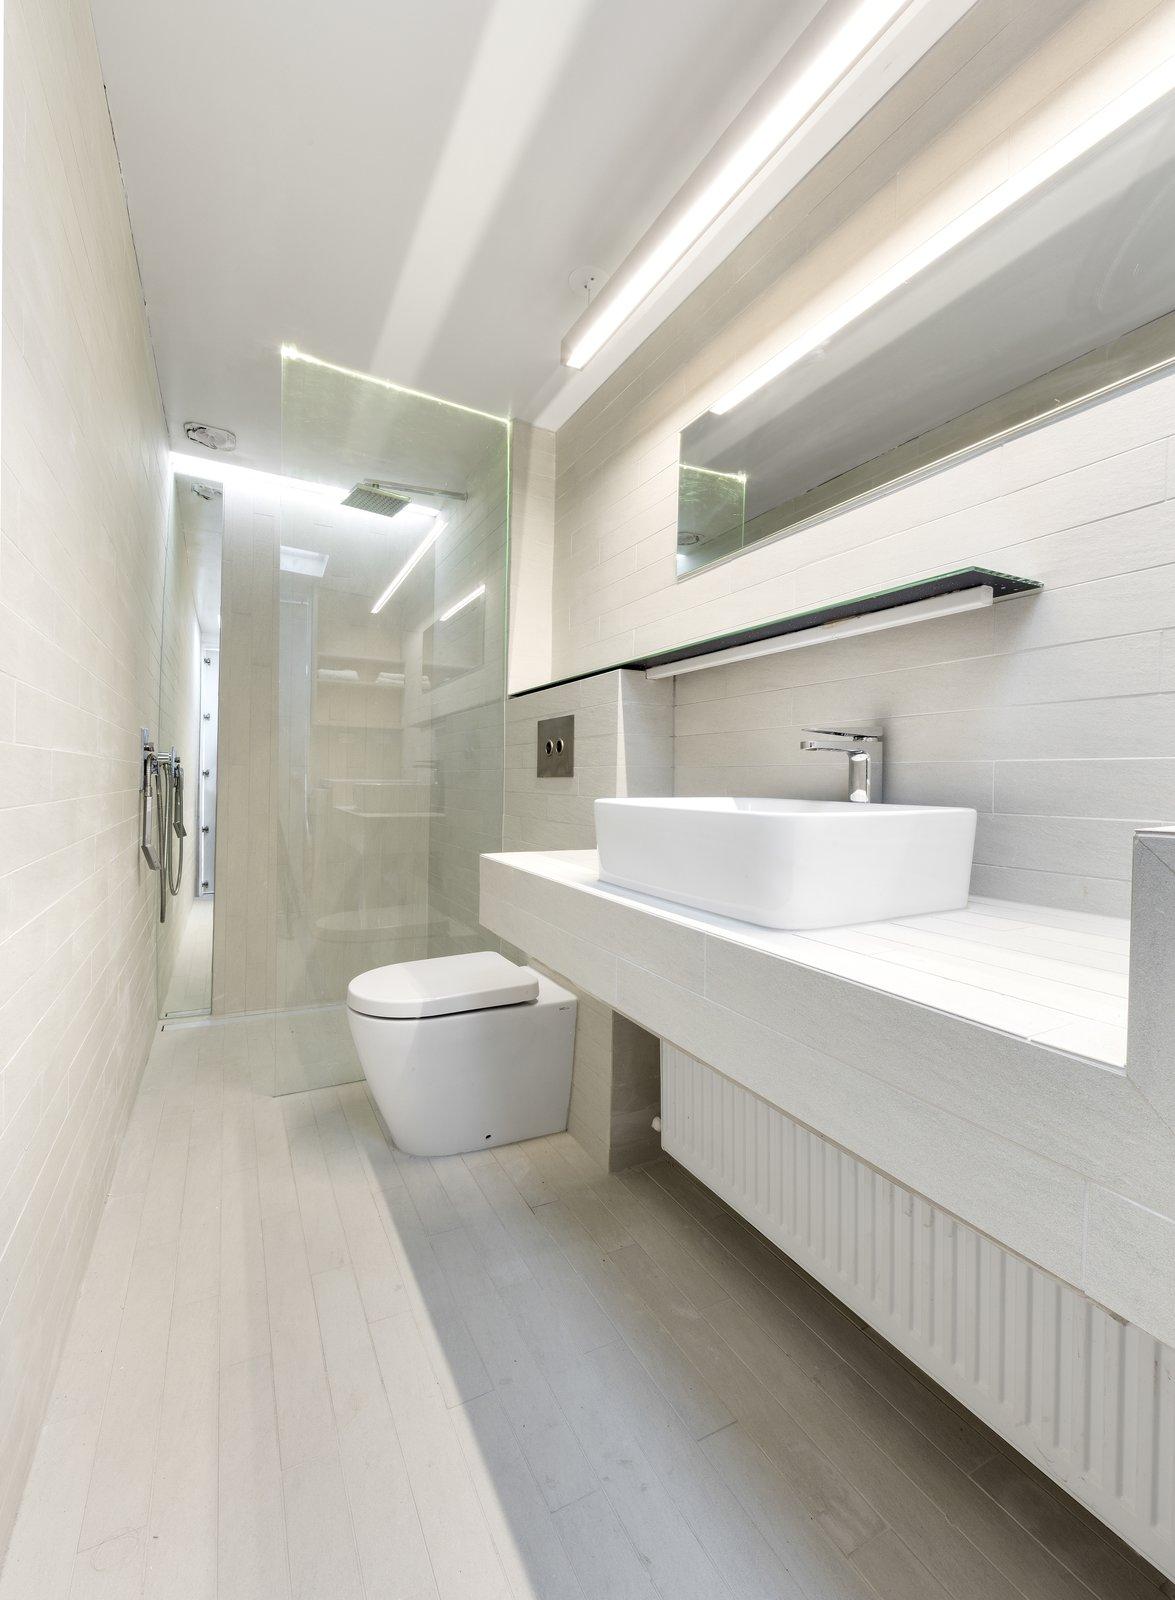 Bath Room, Tile Counter, Porcelain Tile Floor, Vessel Sink, Open Shower, Ceiling Lighting, Accent Lighting, Pendant Lighting, Porcelain Tile Wall, One Piece Toilet, and Recessed Lighting Bathroom  Curtain Cottage